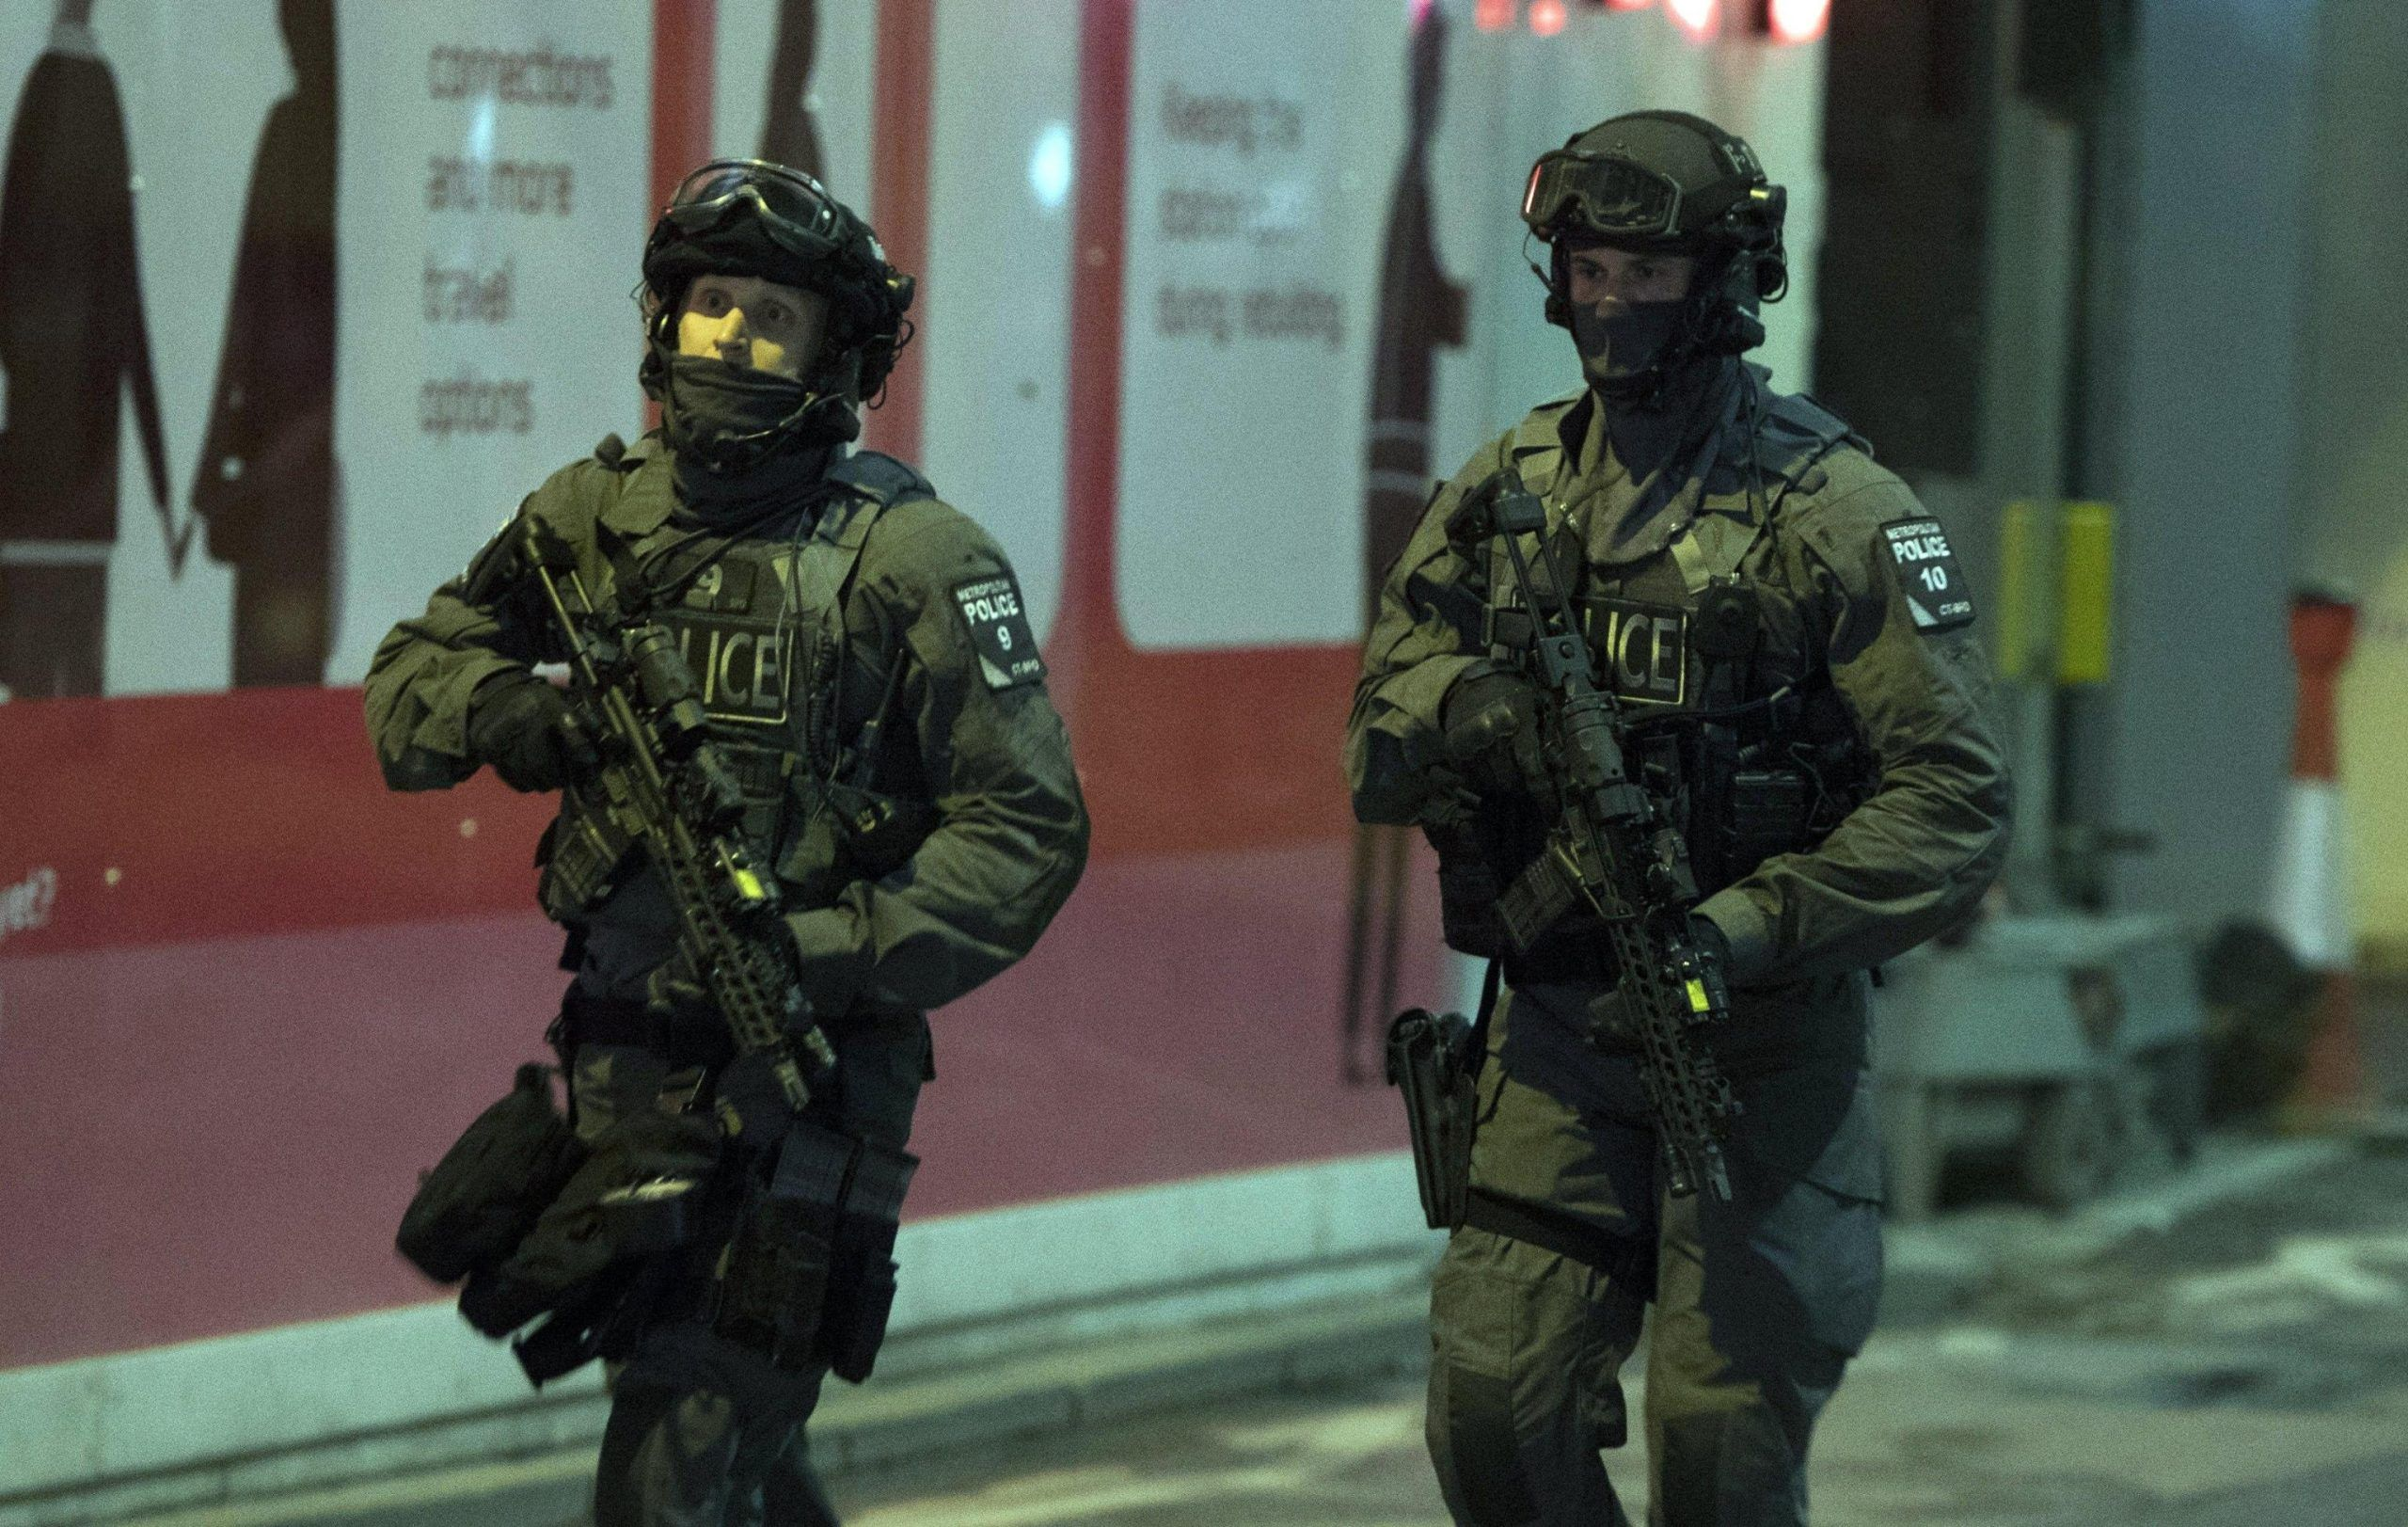 Reports of a van hitting pedestrials at London Bridge